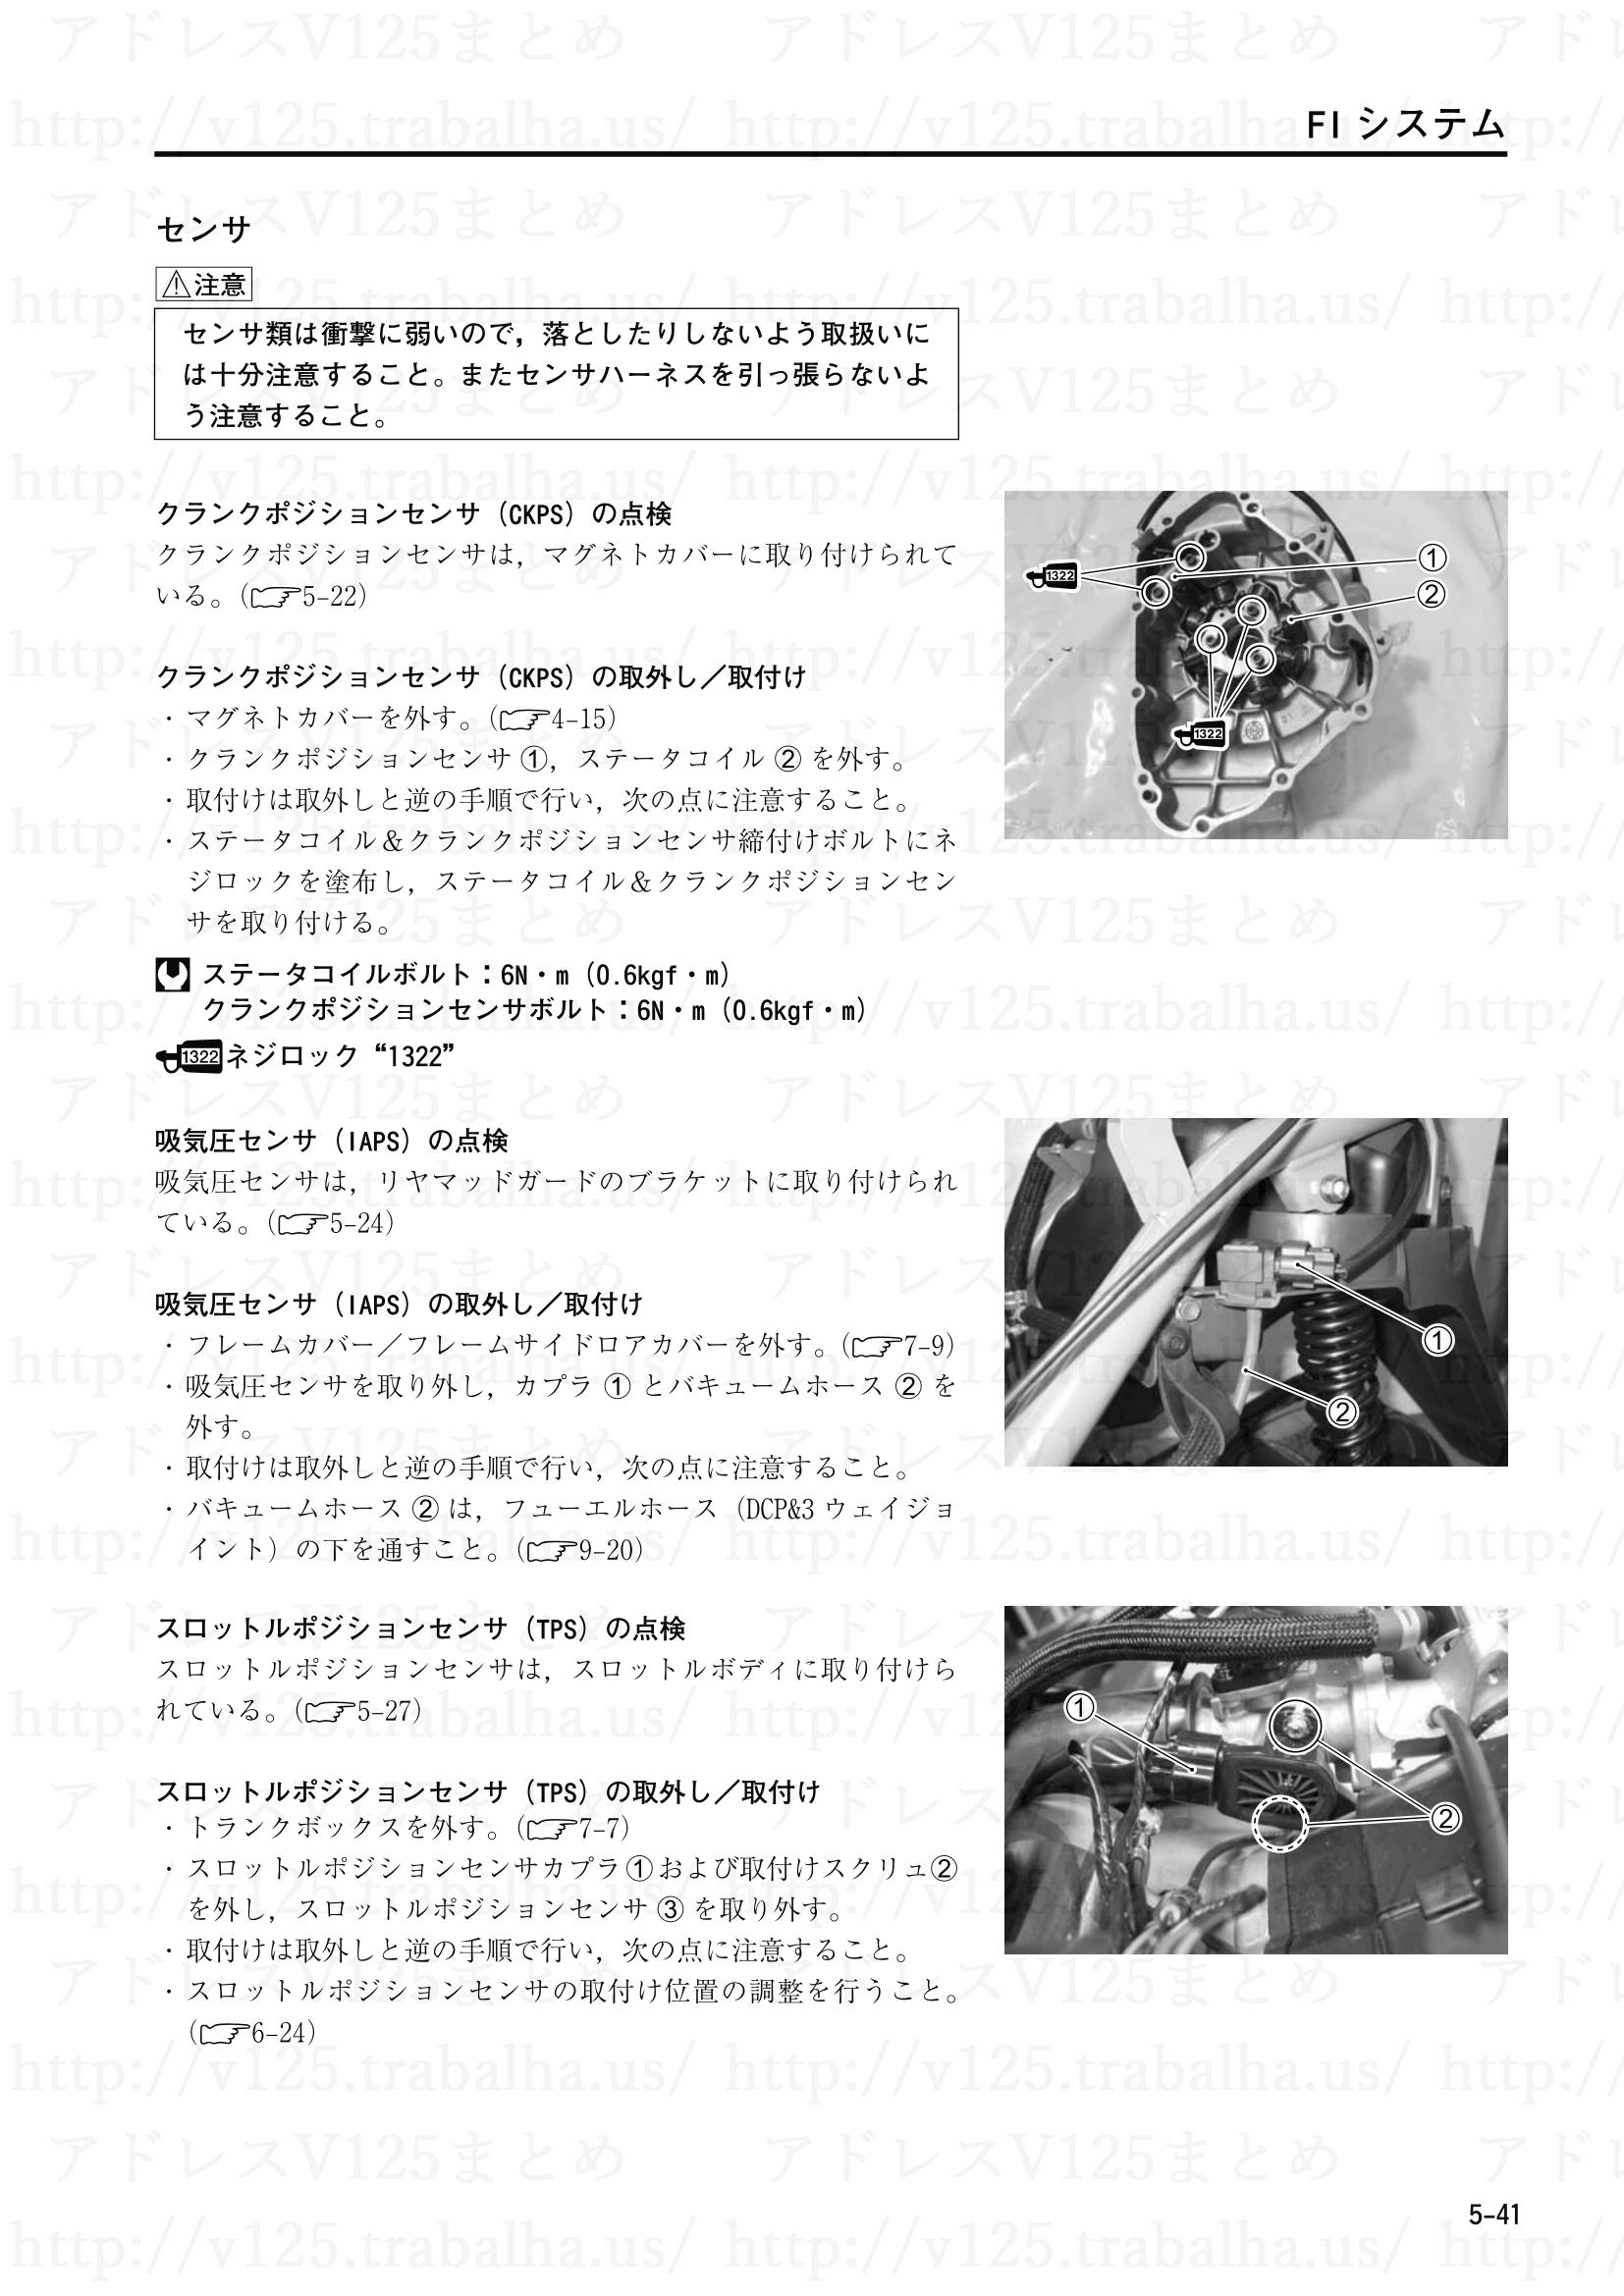 5-41【FIシステム】センサ1